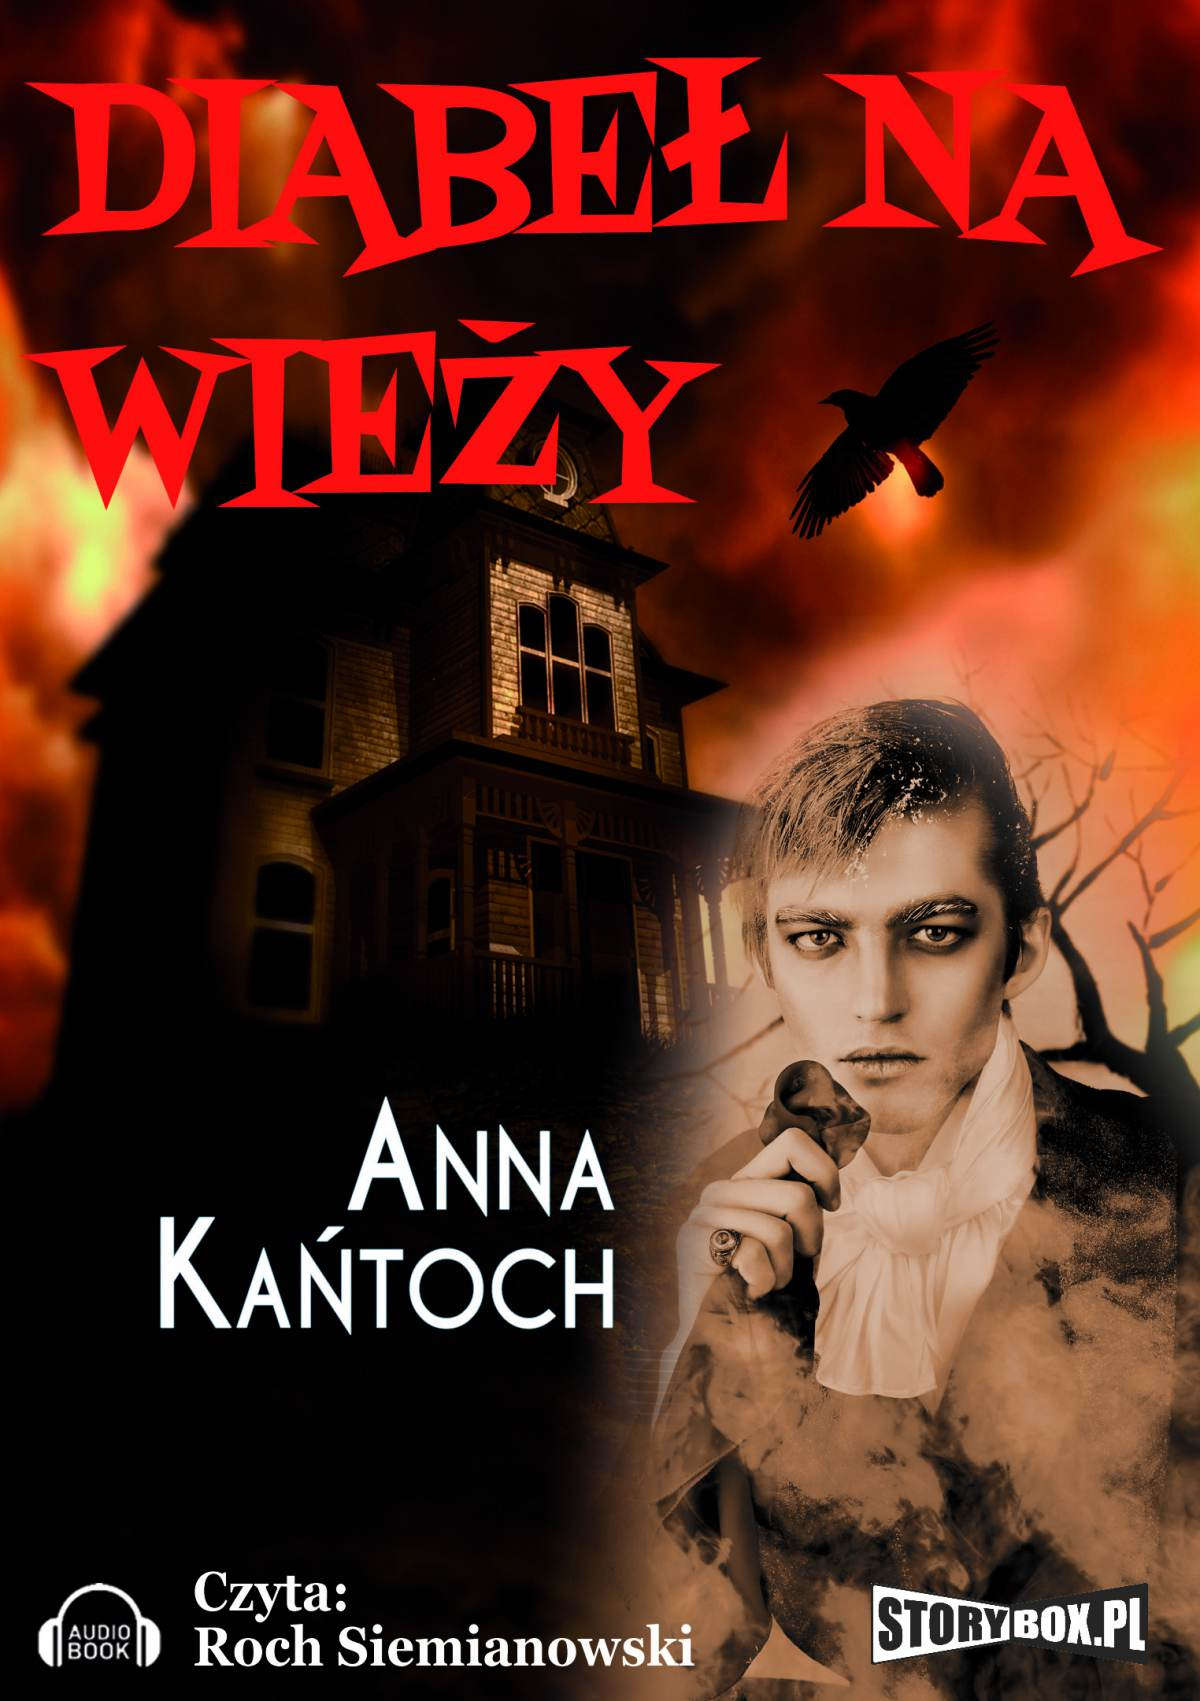 Kańtoch Anna Diabeł Na Wieży